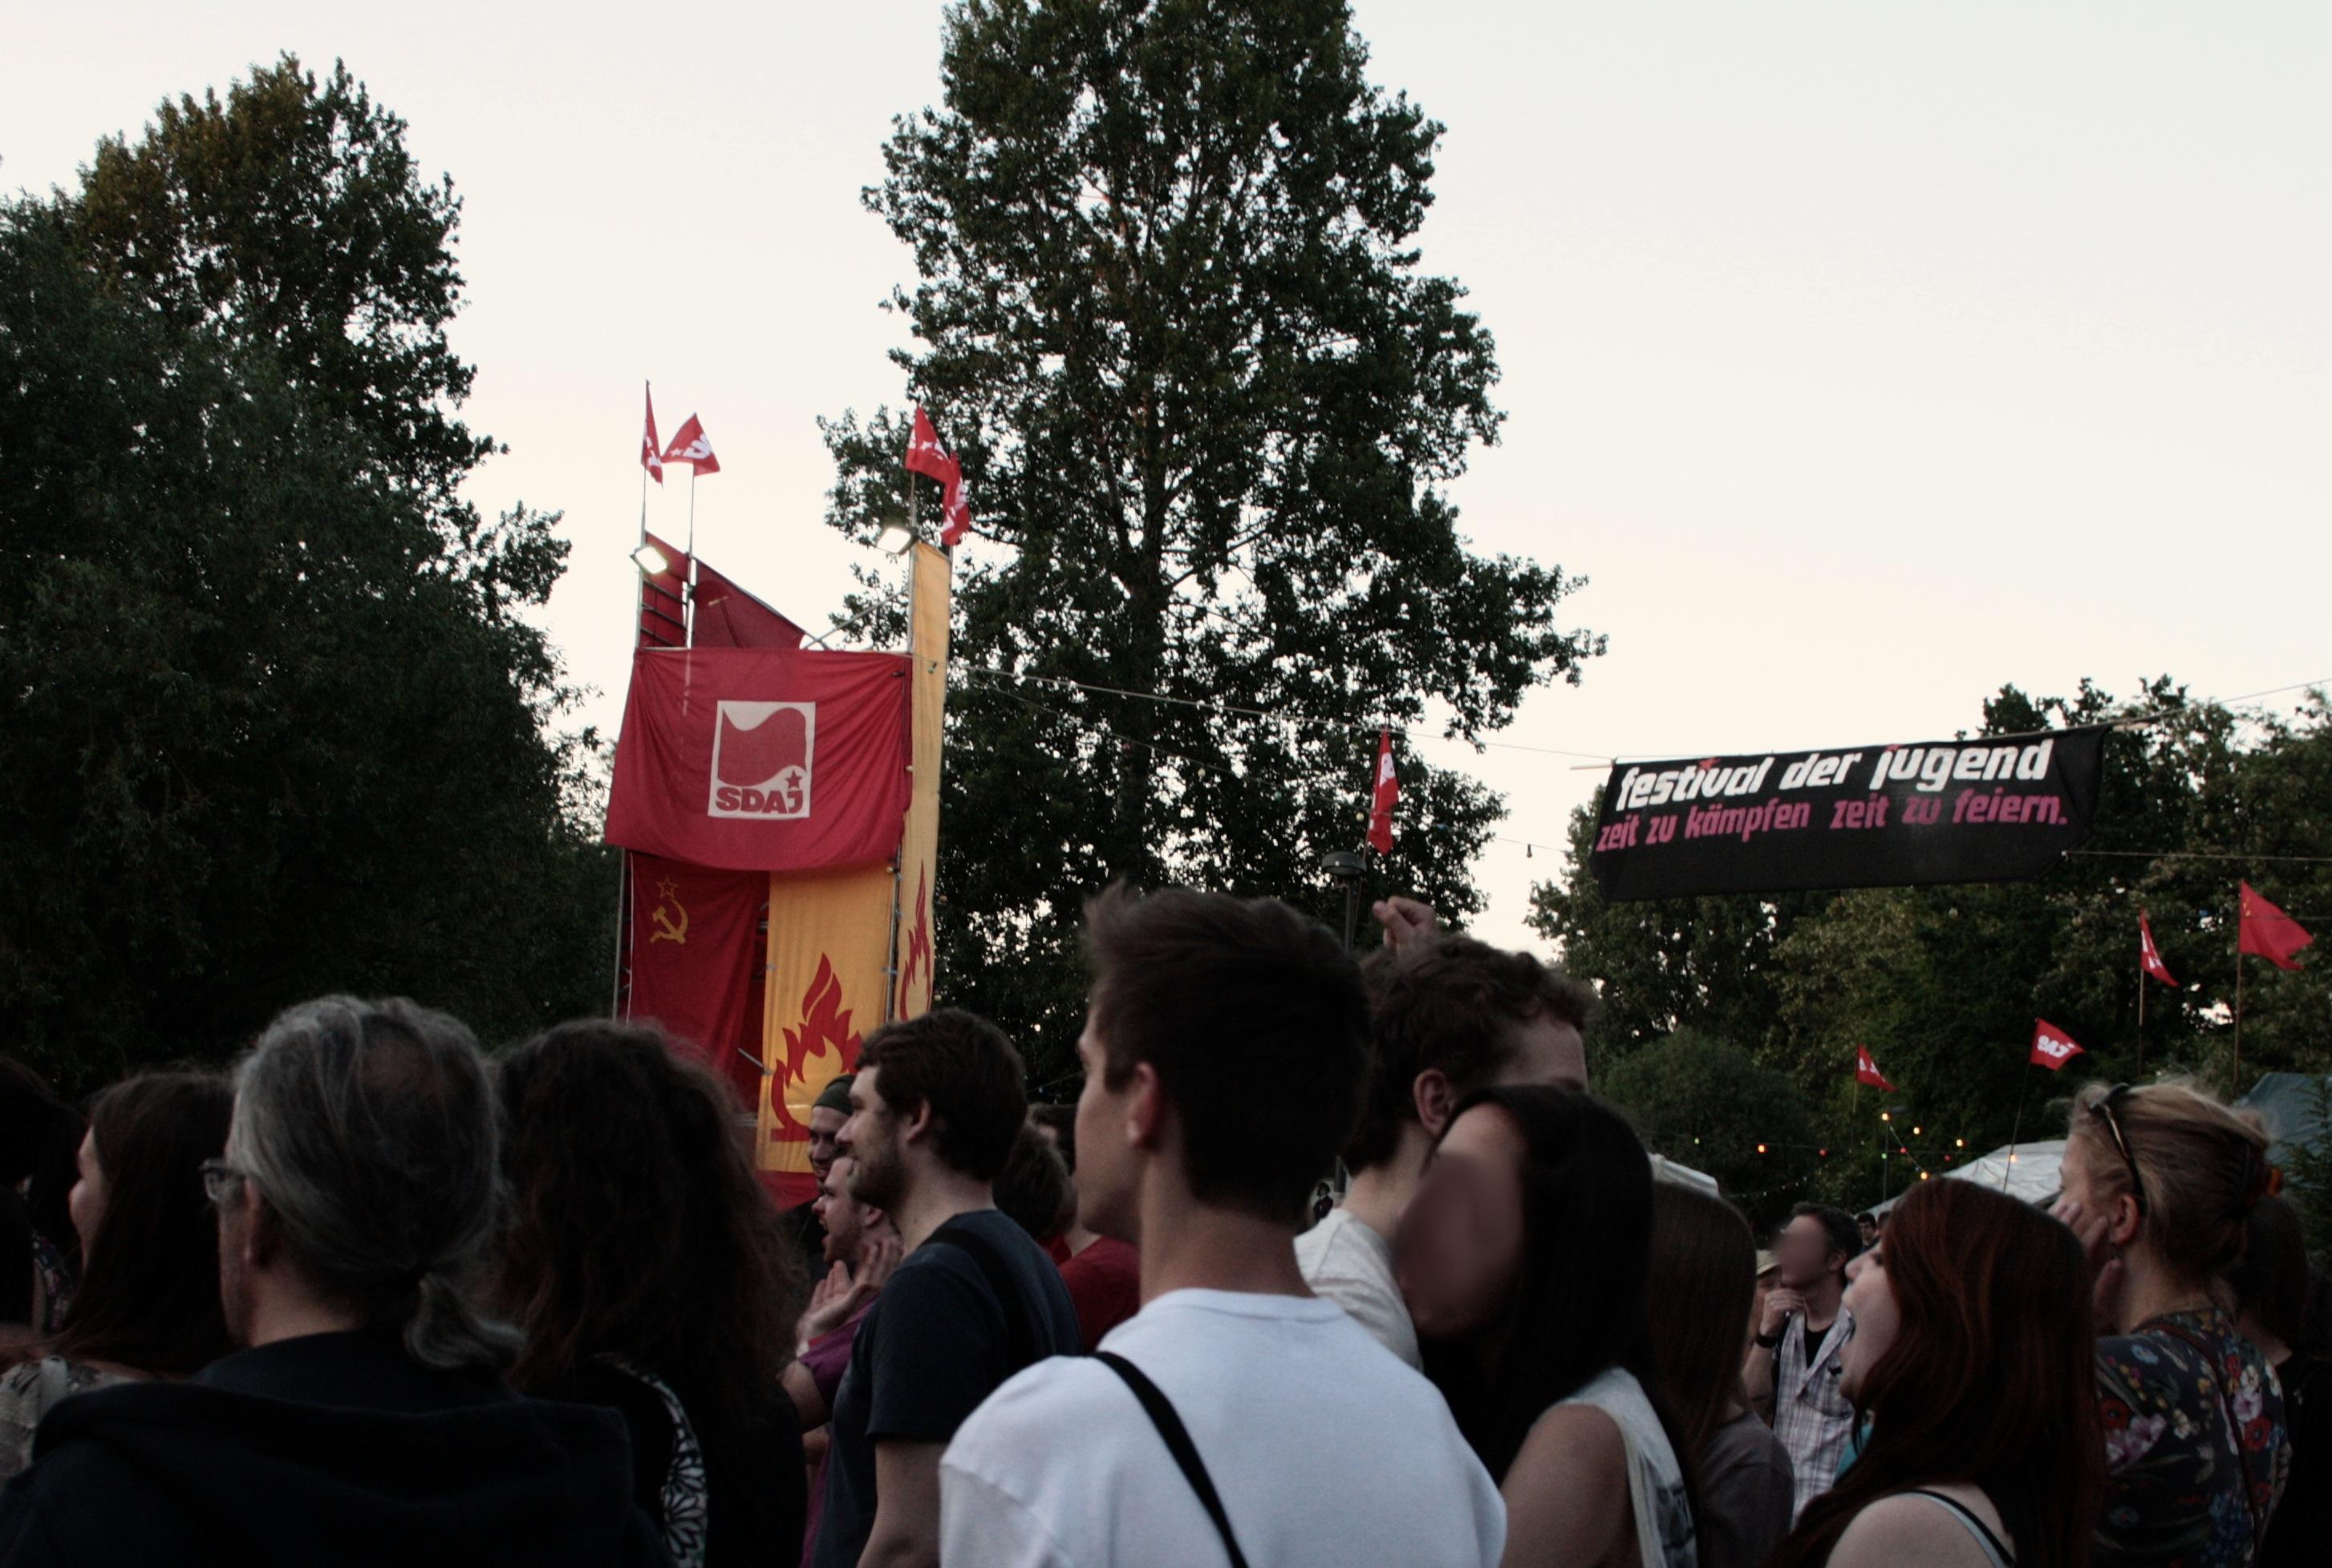 Festival der Jugend 2012 war ein voller Erfolg!